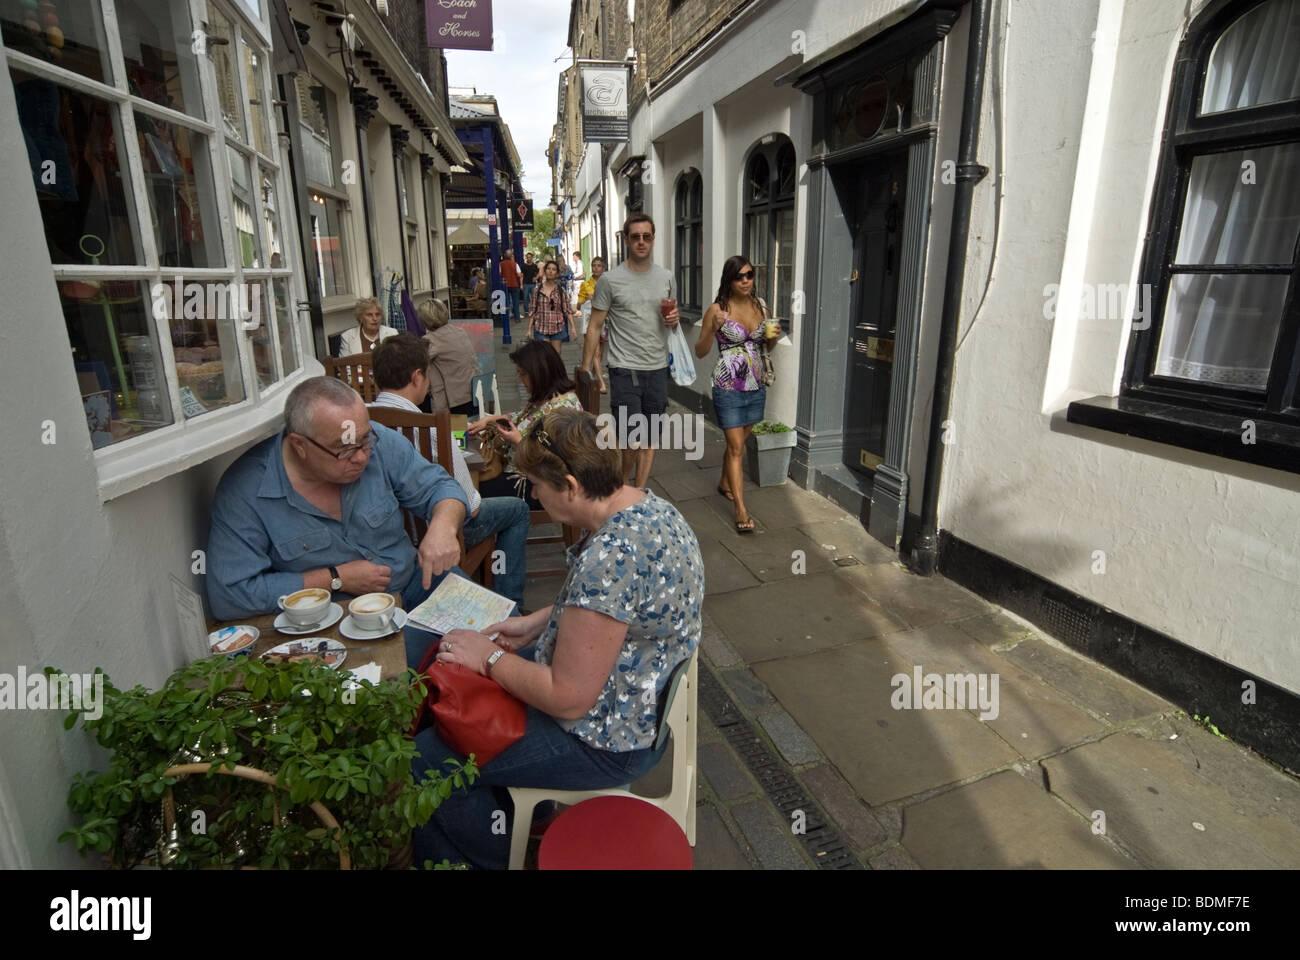 ELDERLY TOURIST COUPLE HAVING LAUNCH IN THE CAFFETERIA GARDEN - Stock Image